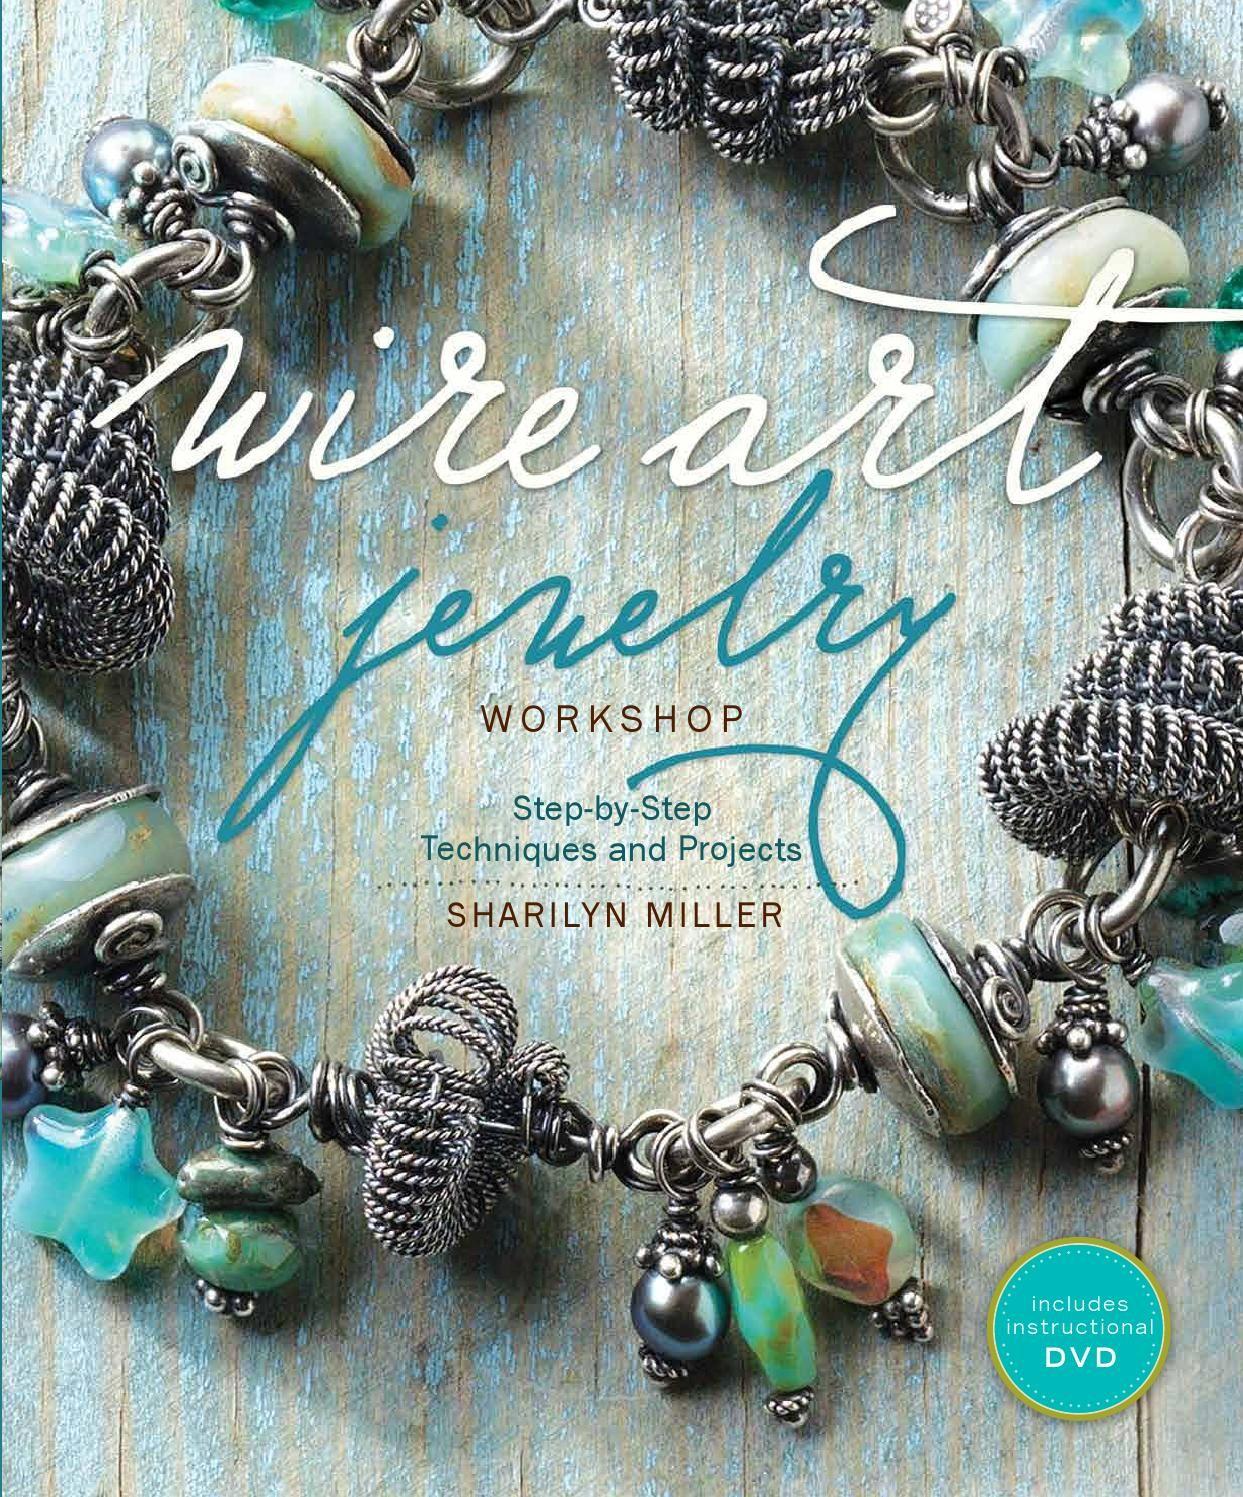 Wire art jewelry workshop - Sharilyn Miller 2011 | Pinterest | Wire ...